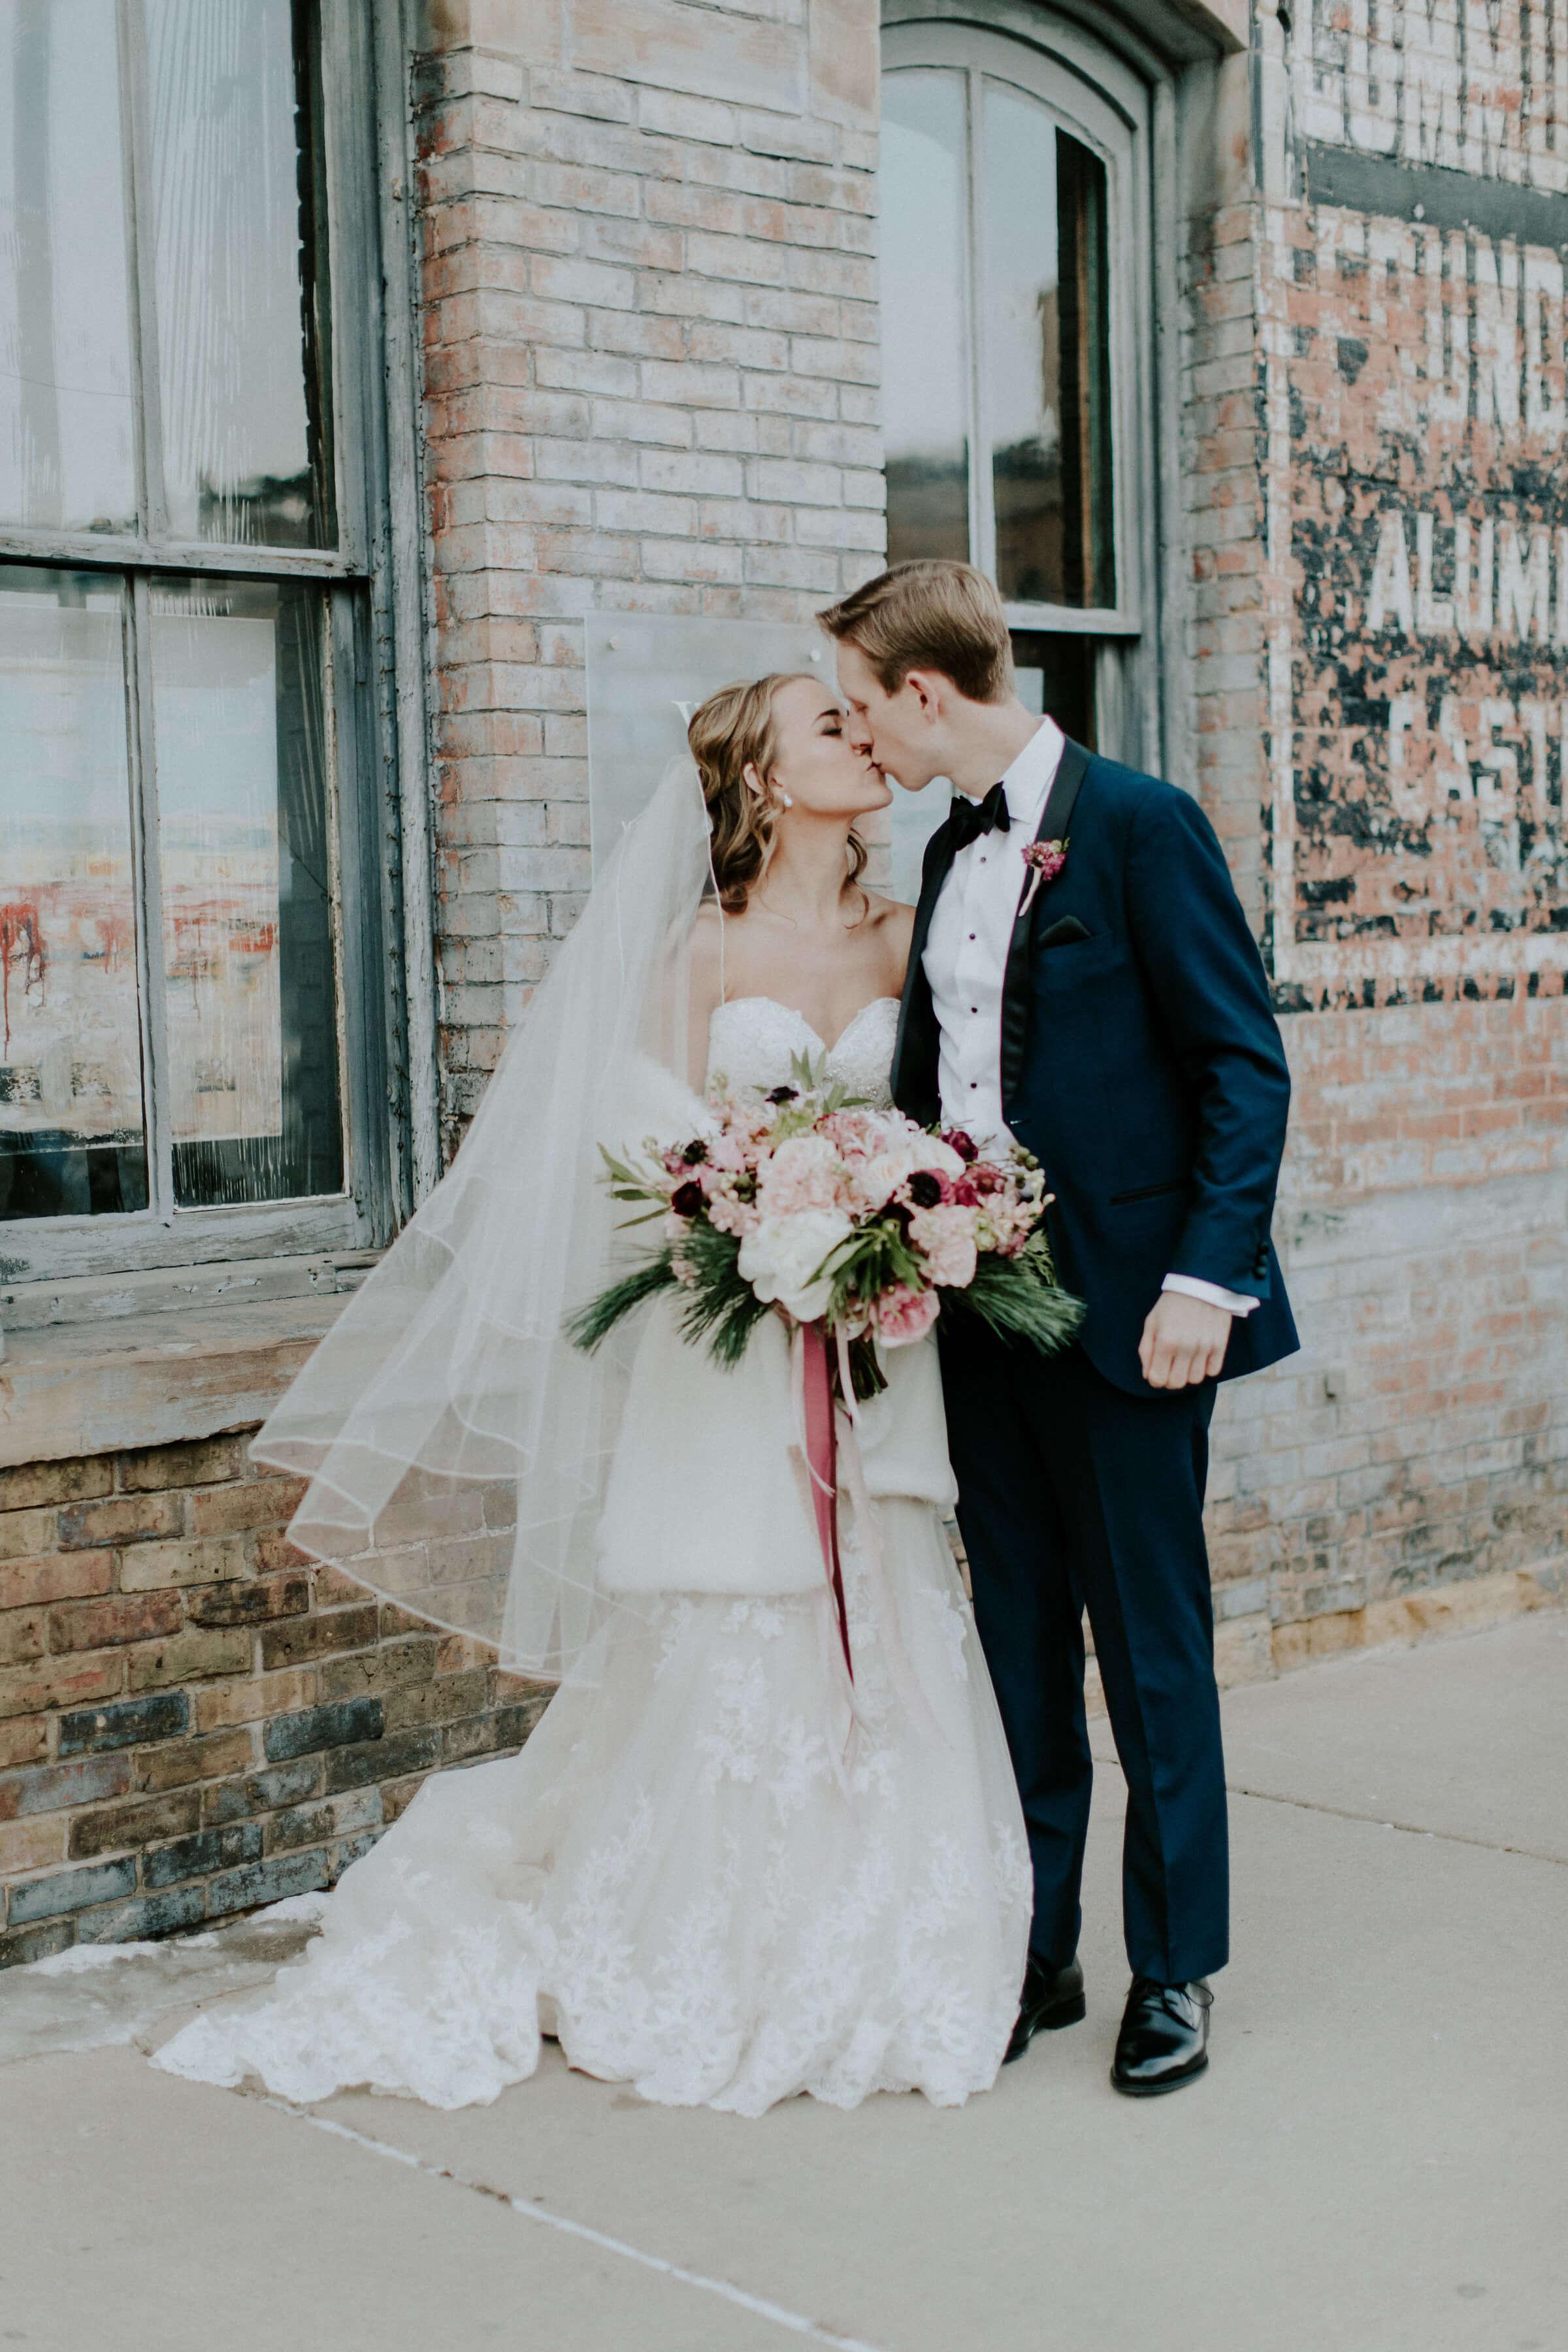 Kim+Greg_Jordan_Wedding_Aria_Russell_Heeter_Photography-164.jpg